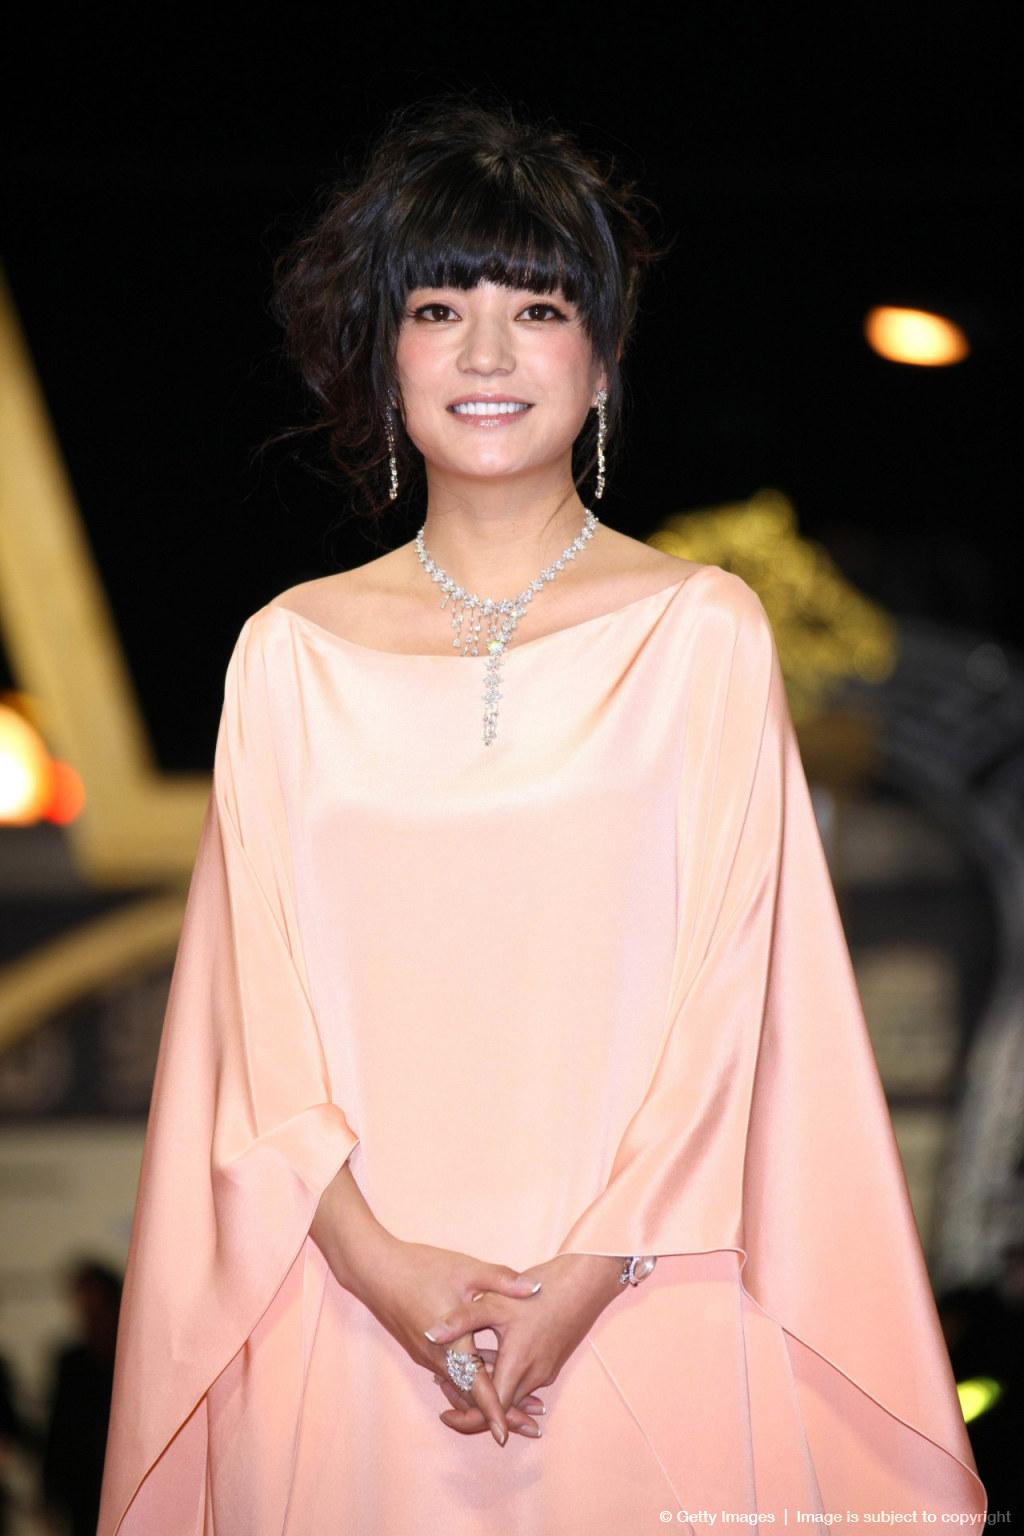 Vicki Zhao - Beauty